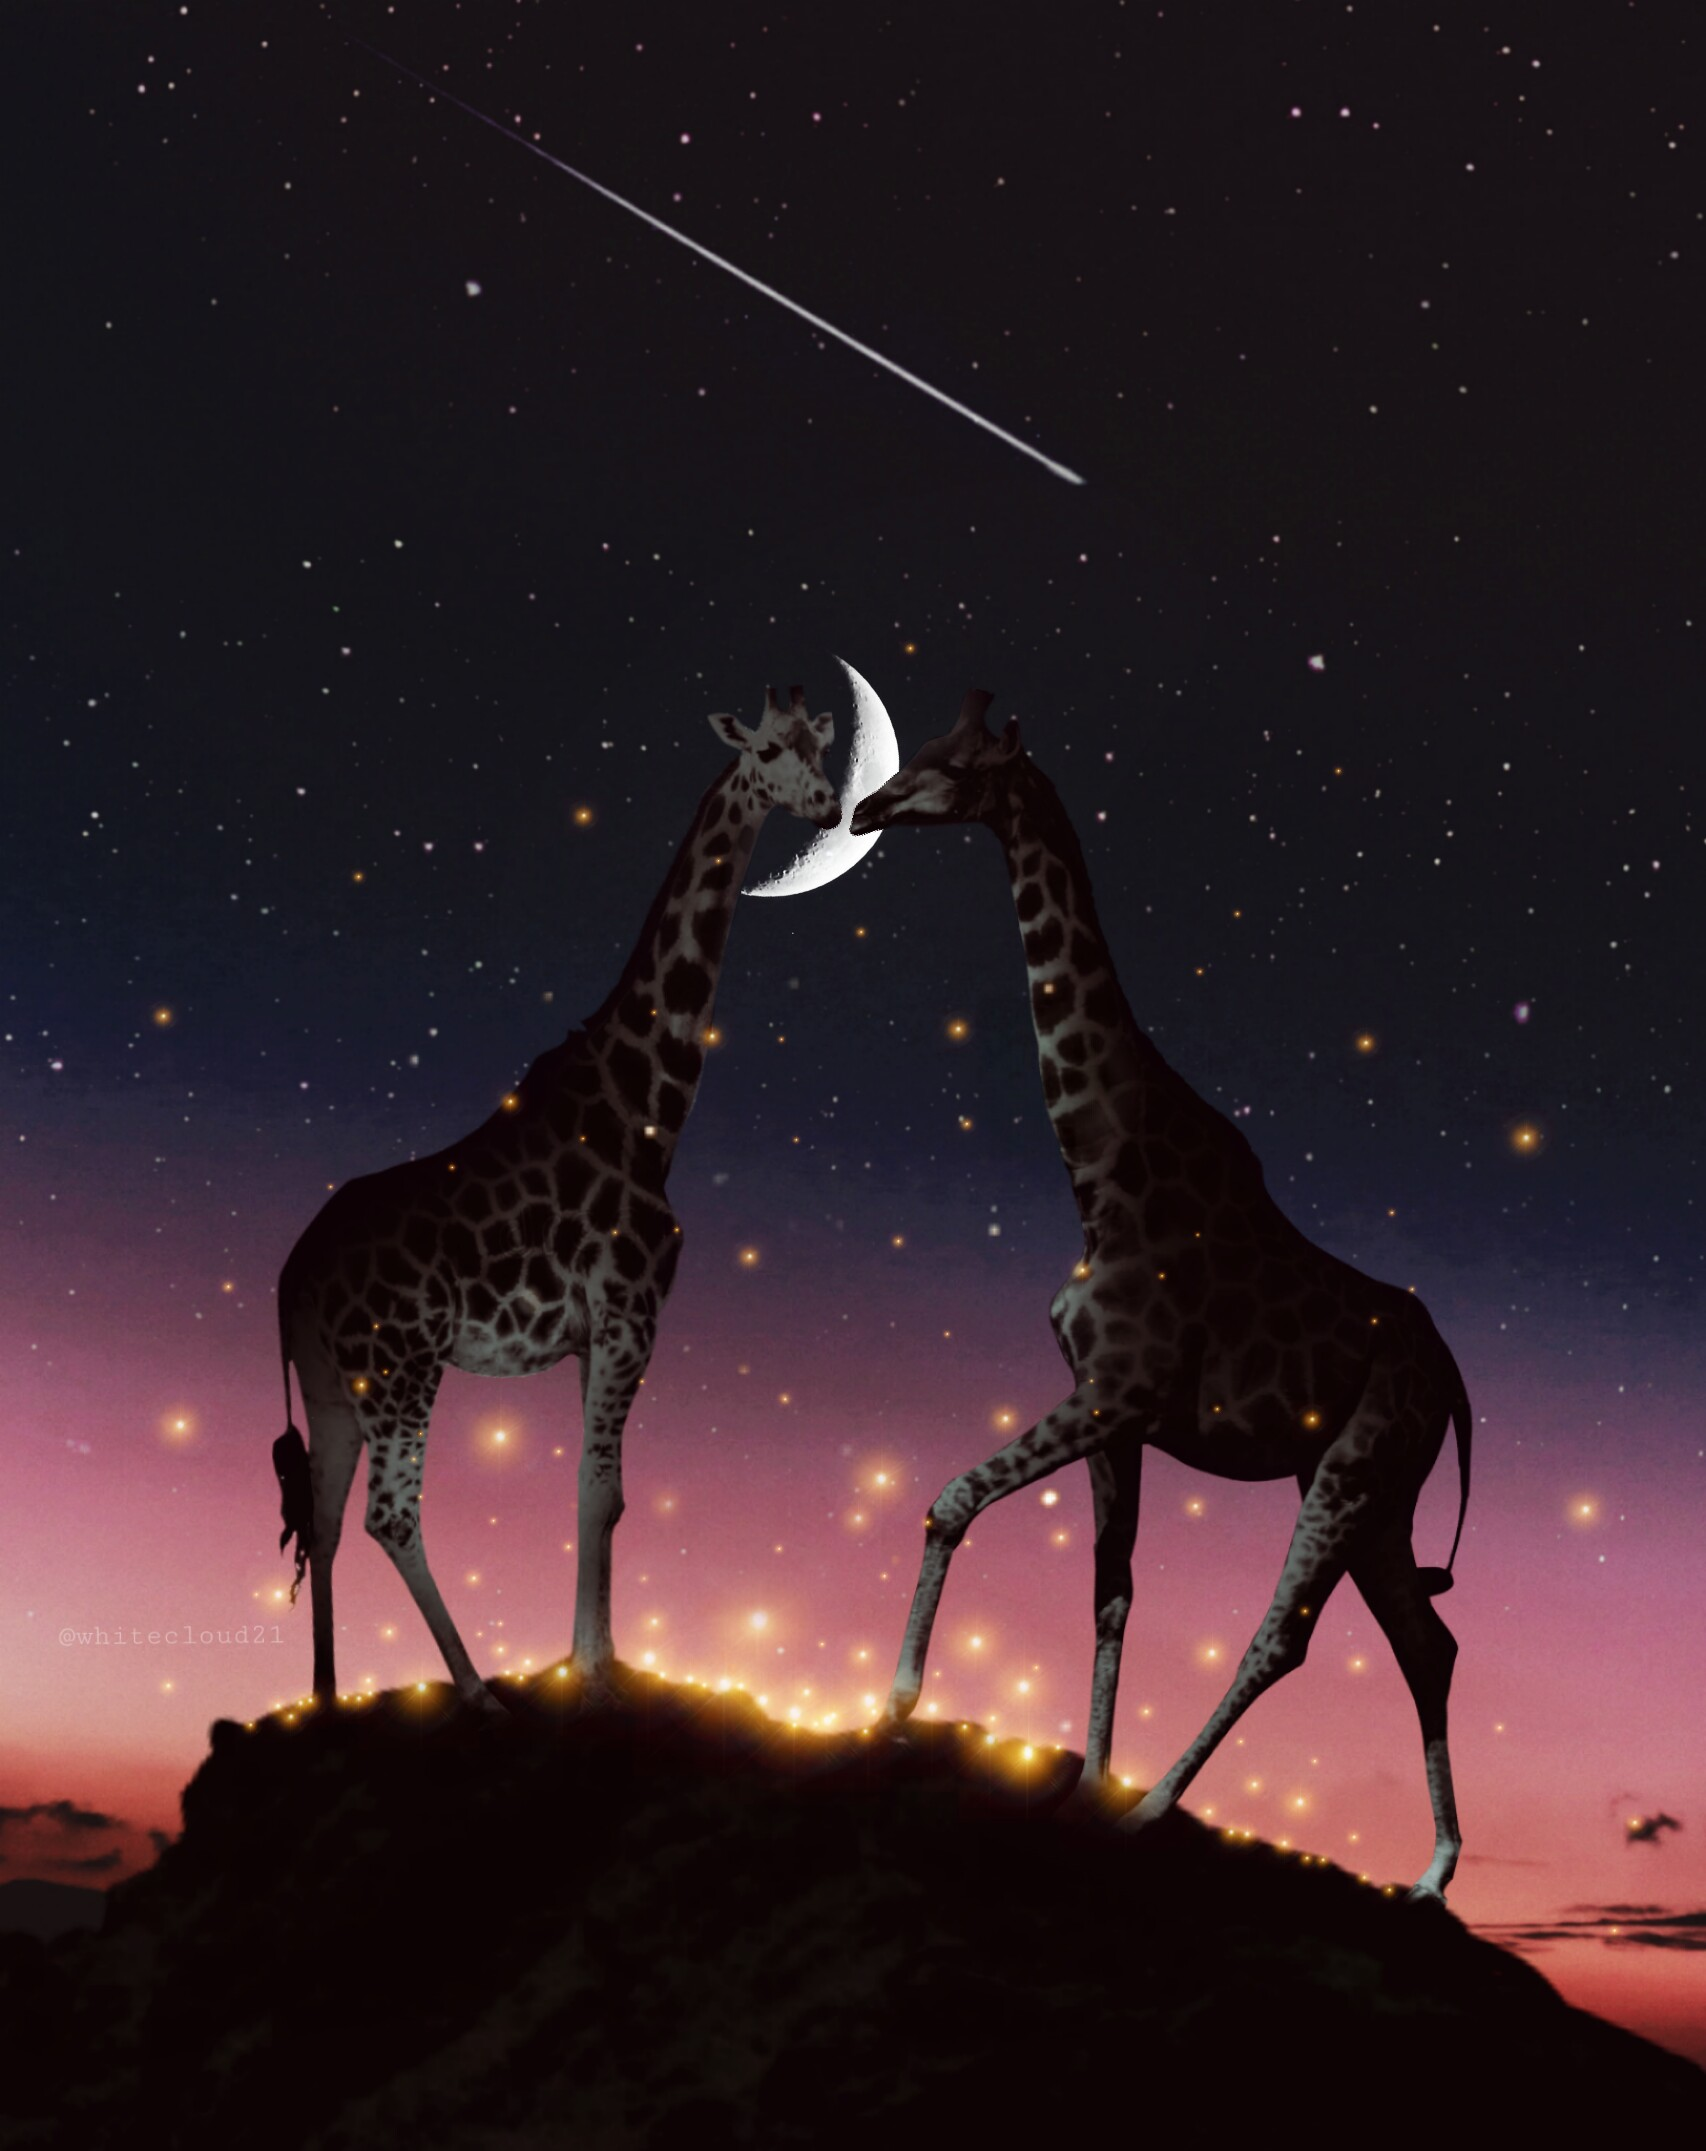 ??✨ #freetoedit #vipbrushtool #giraffe #madewithpicsart #madebyme #night #lights #firefly #animals #love #valentinesday #myedit @picsart